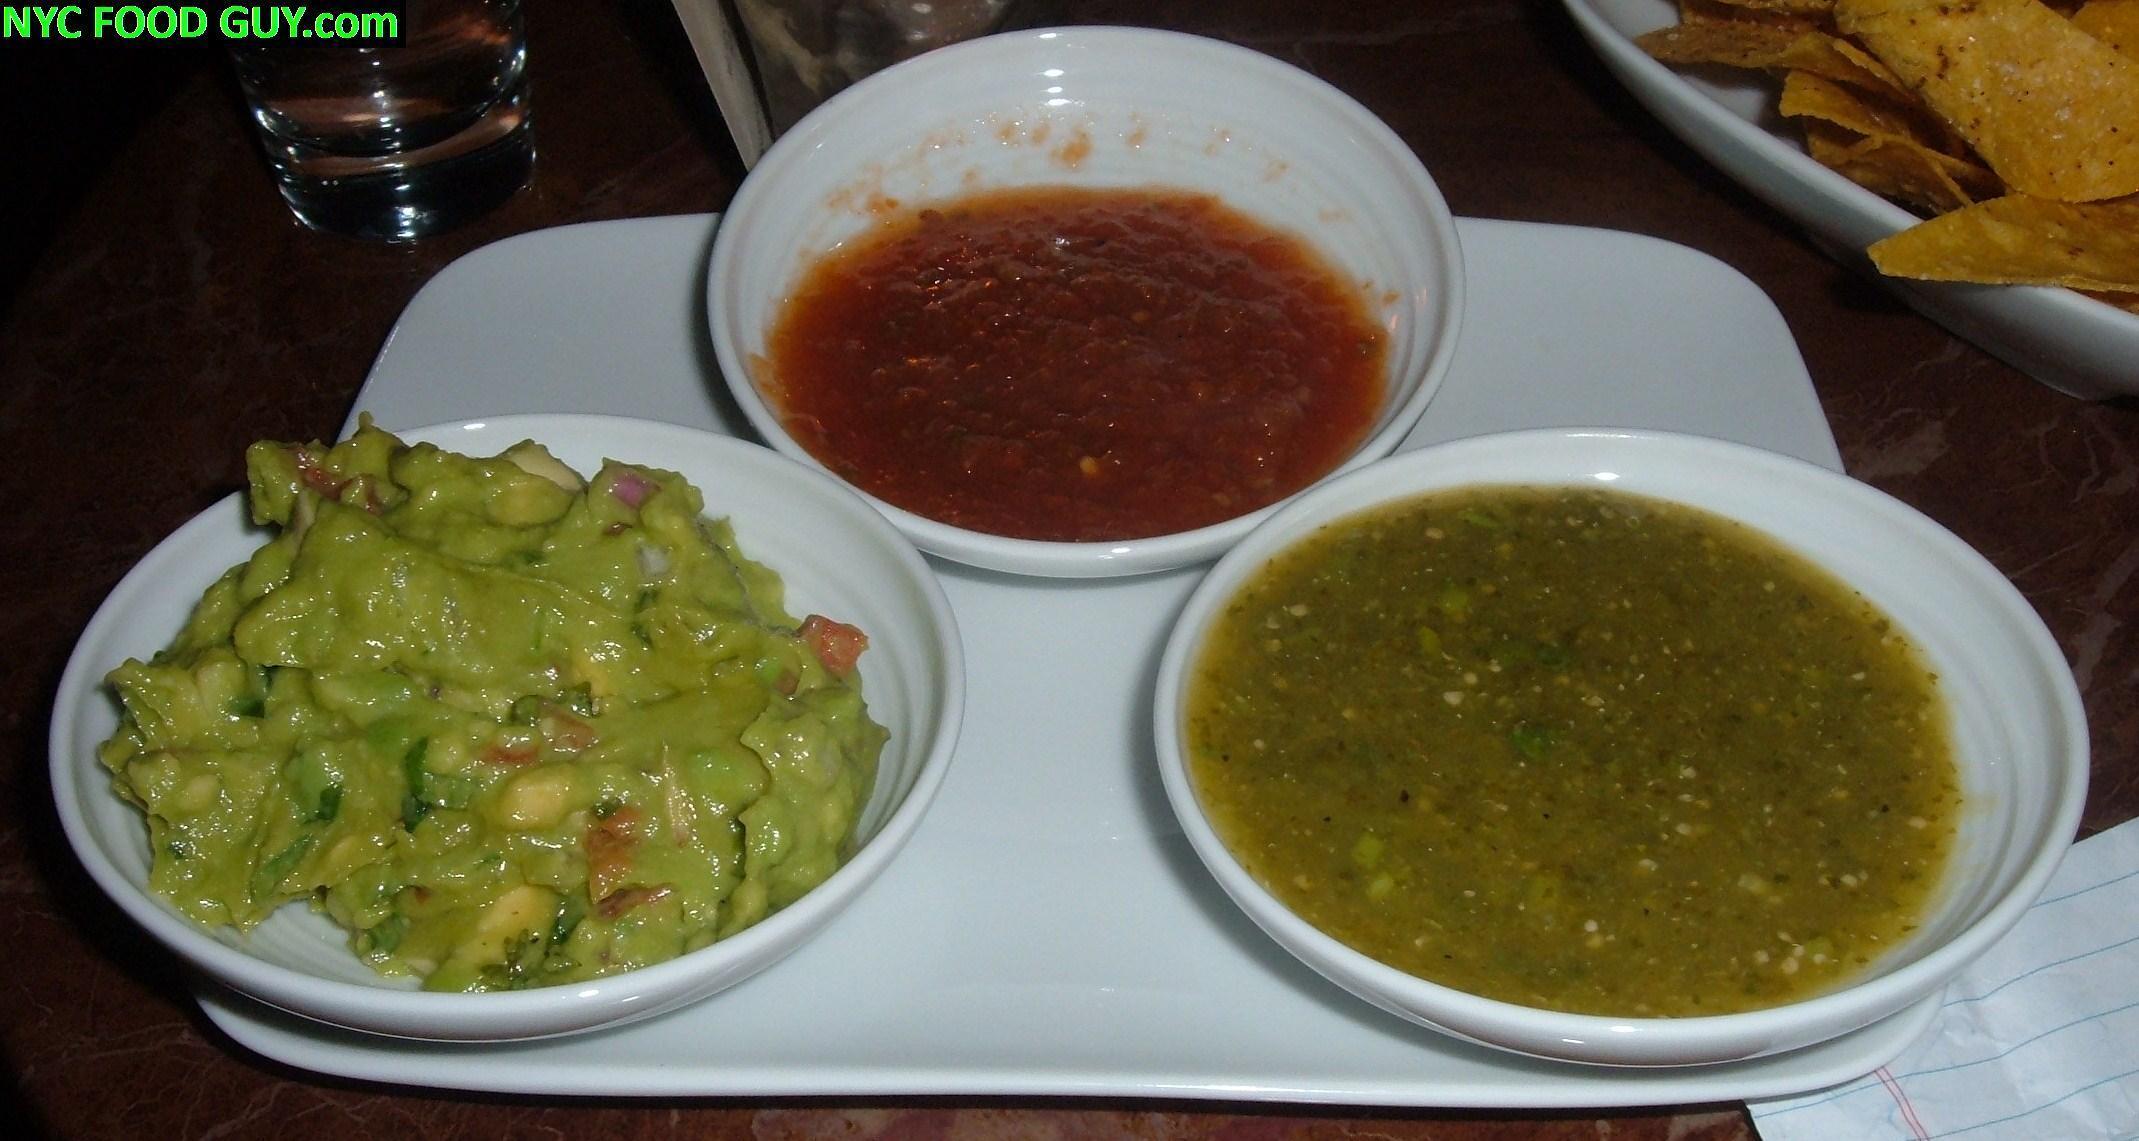 Fresh Guacamole, Smokey, Steaming Tomato & Spicy Salsa Verde